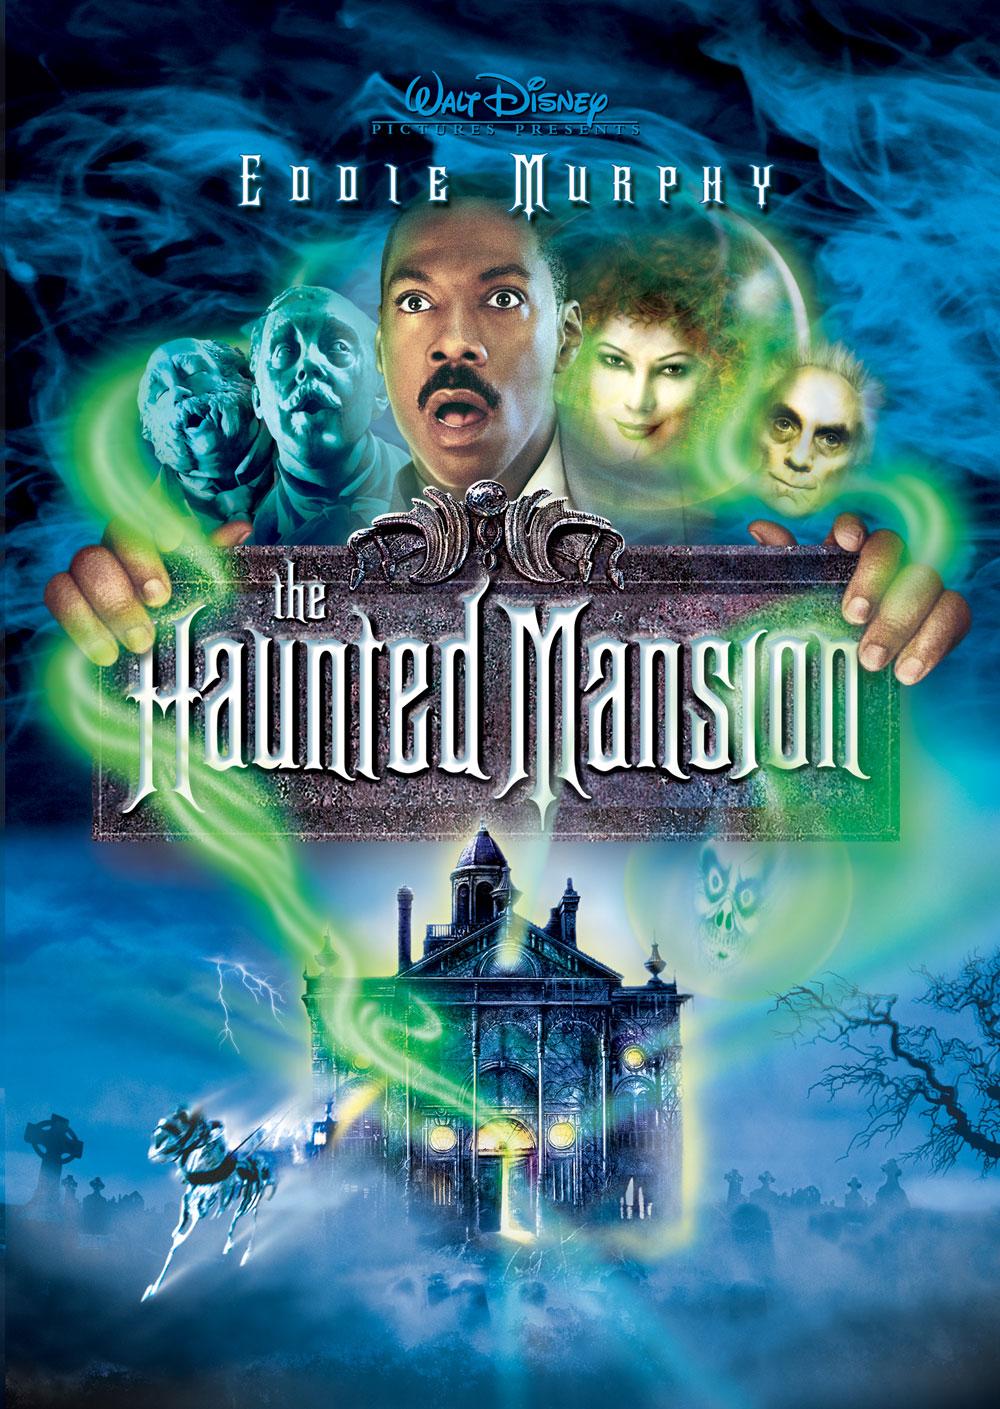 The Haunted Mansion (2003) บ้านเฮี้ยน ผีชวนฮา